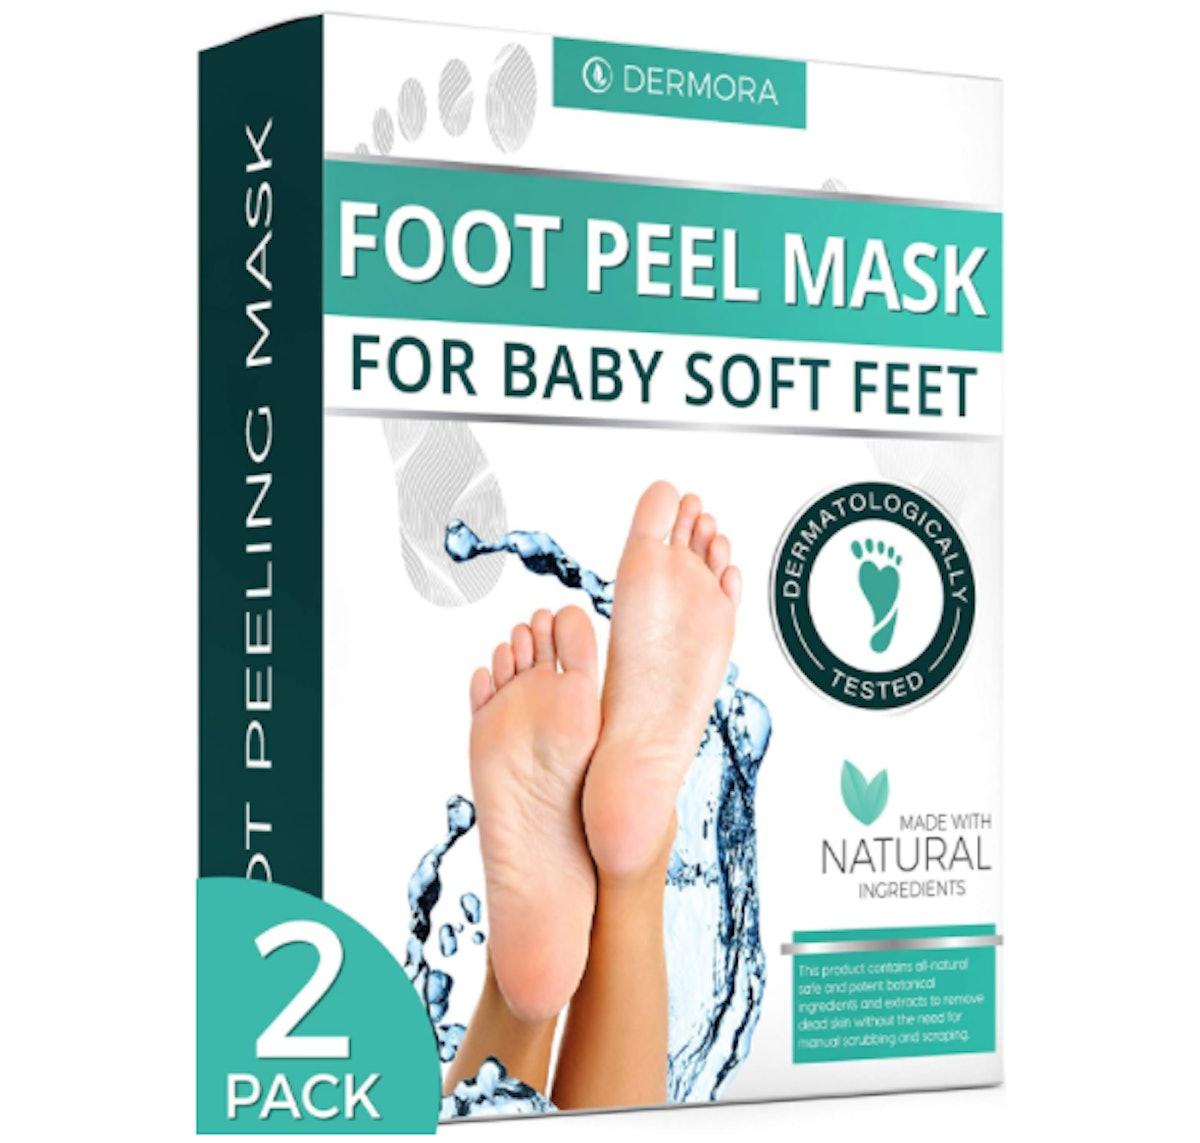 DERMORA Foot Peel Masks (2-Pack)